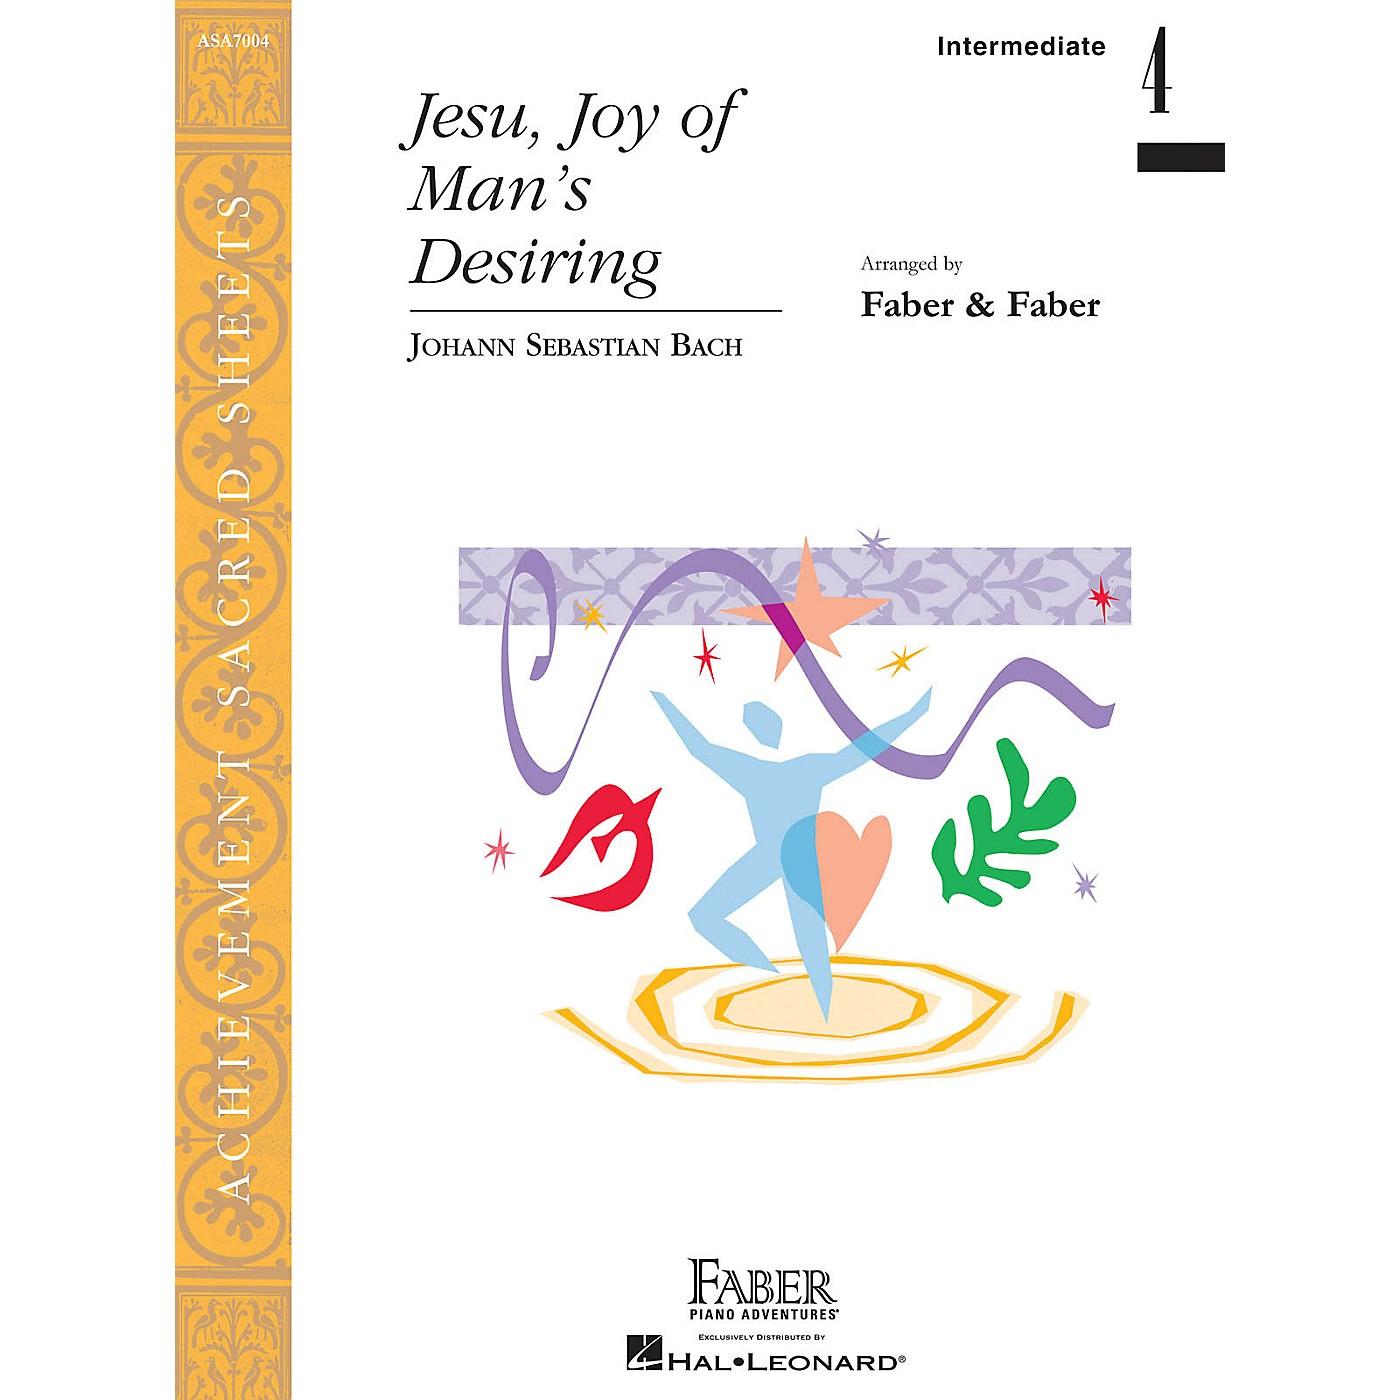 Faber Piano Adventures Jesu, Joy of Man's Desiring Faber Piano Adventures Series by Johann Sebastian Bach (Level Inter/Level 4) thumbnail